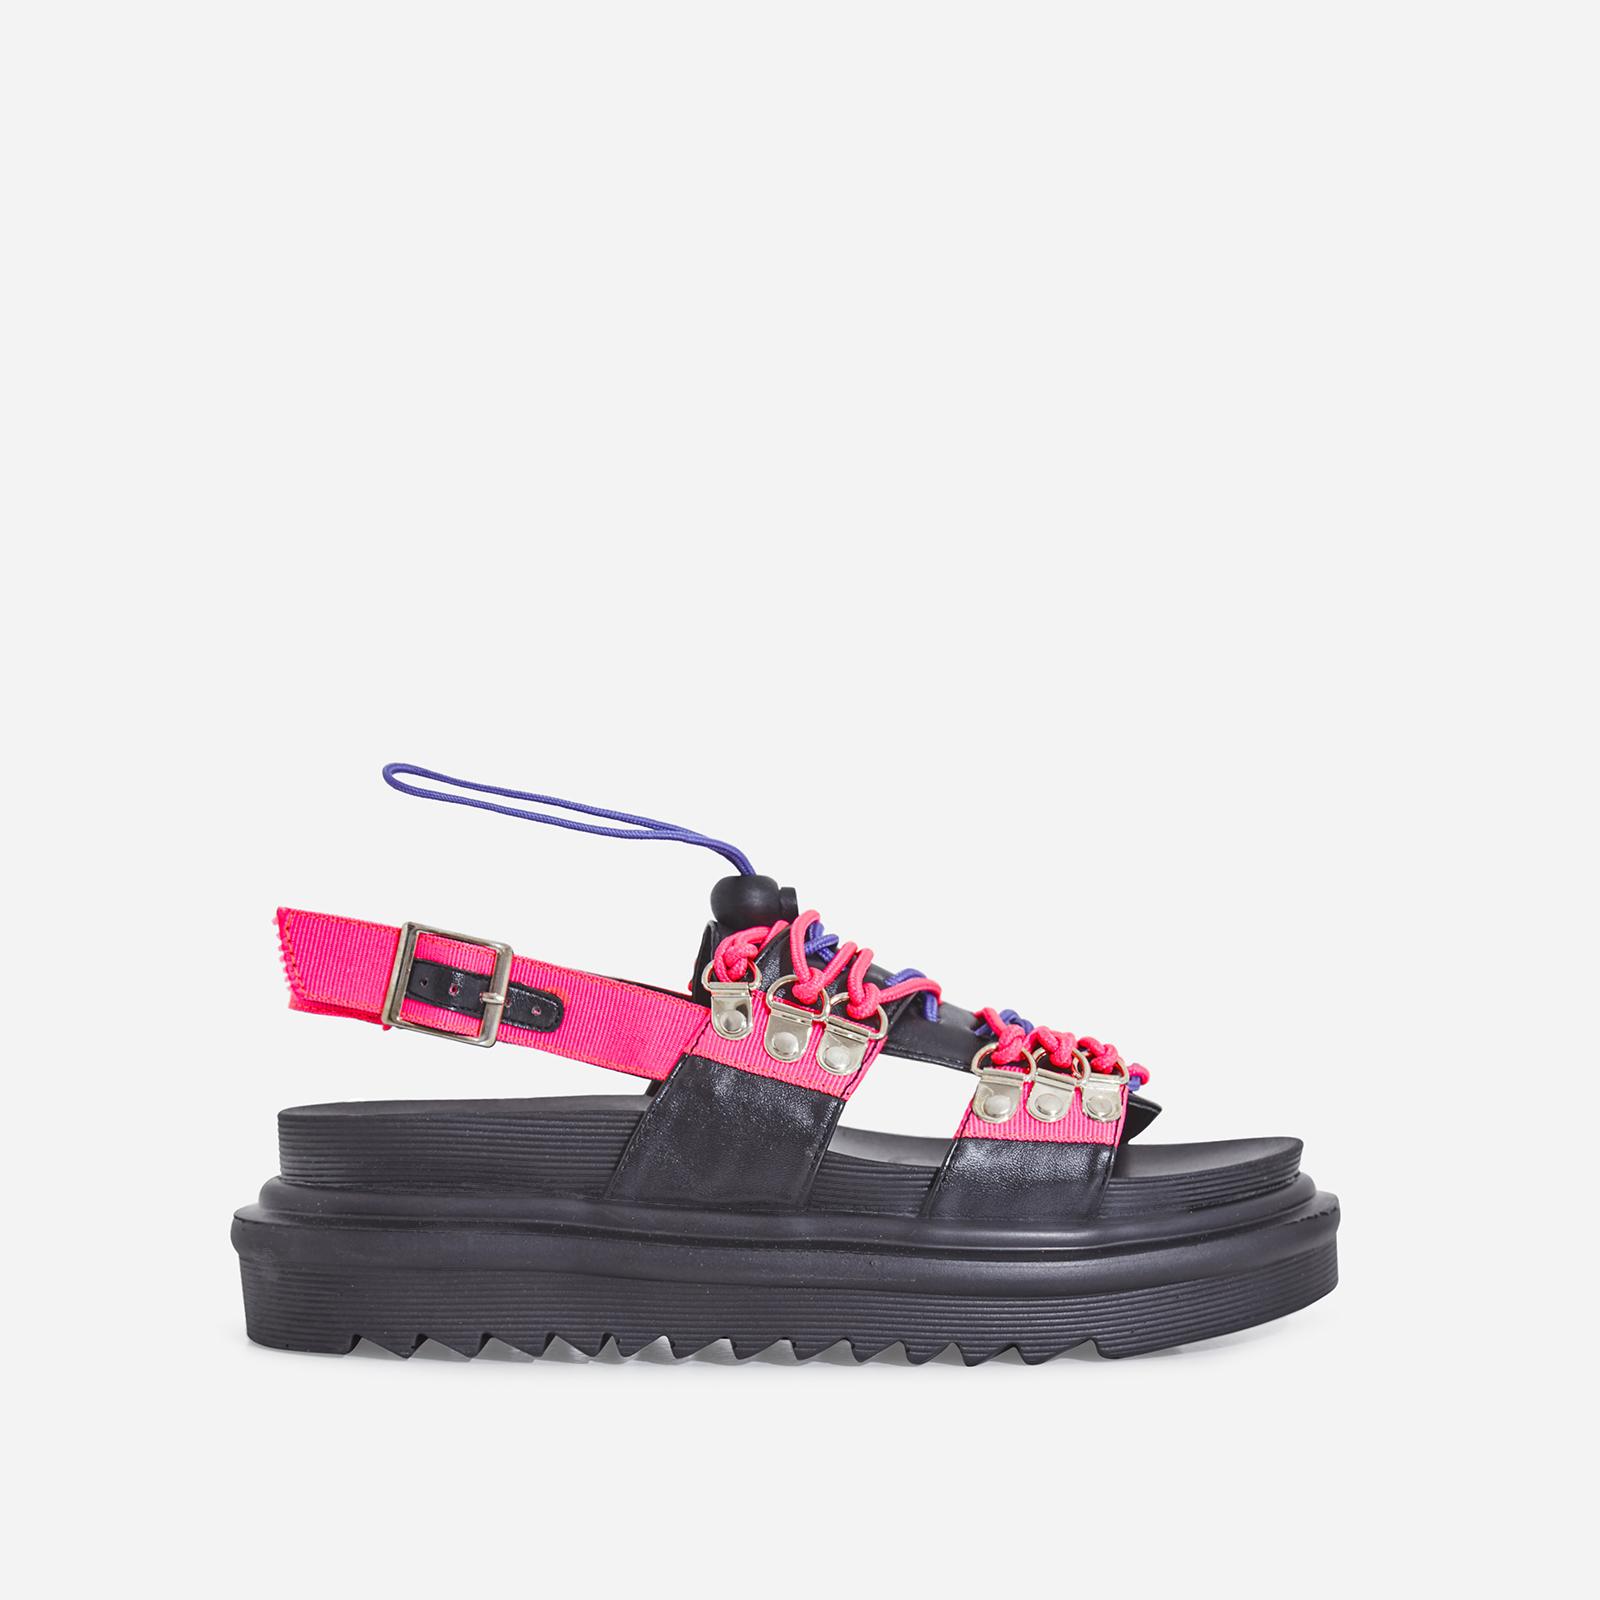 Sierra Lace Up Sandal In Pink